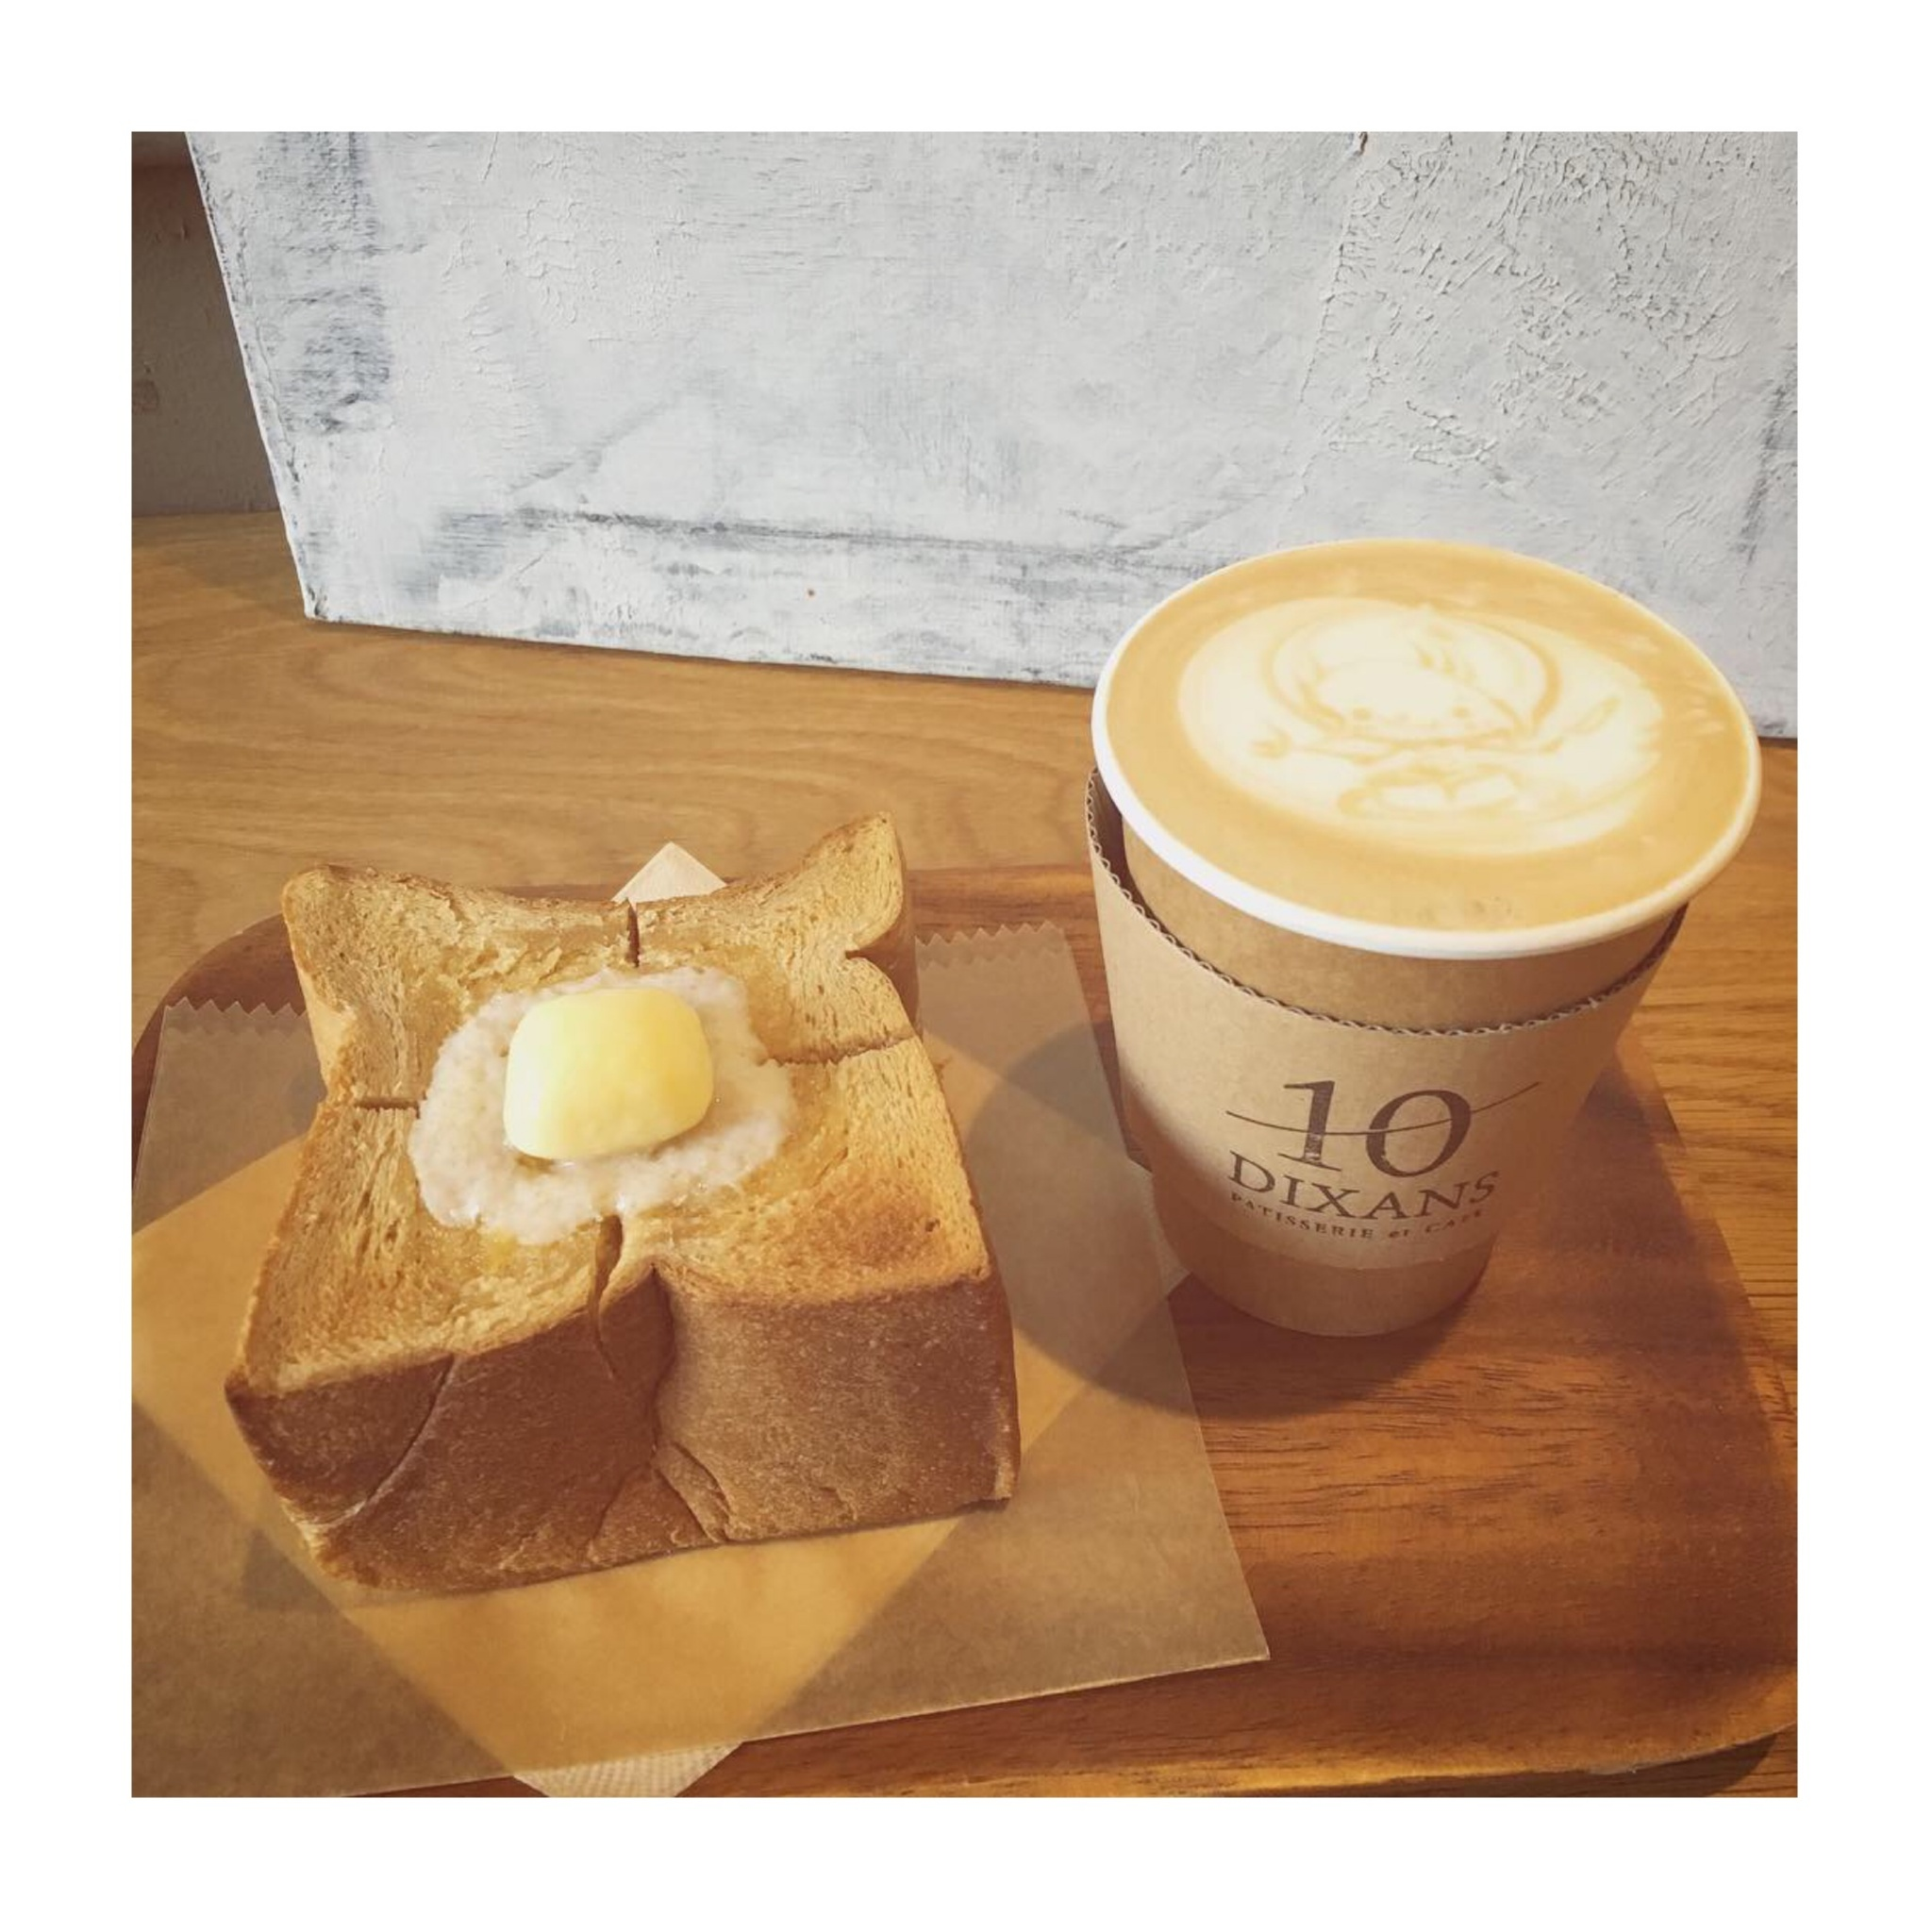 #12【#cafestagram】❤️:《東京•水道橋》ふわふわ絶品!厚切りトーストと可愛いラテアートが人気のカフェ「DIXANS」☻_2